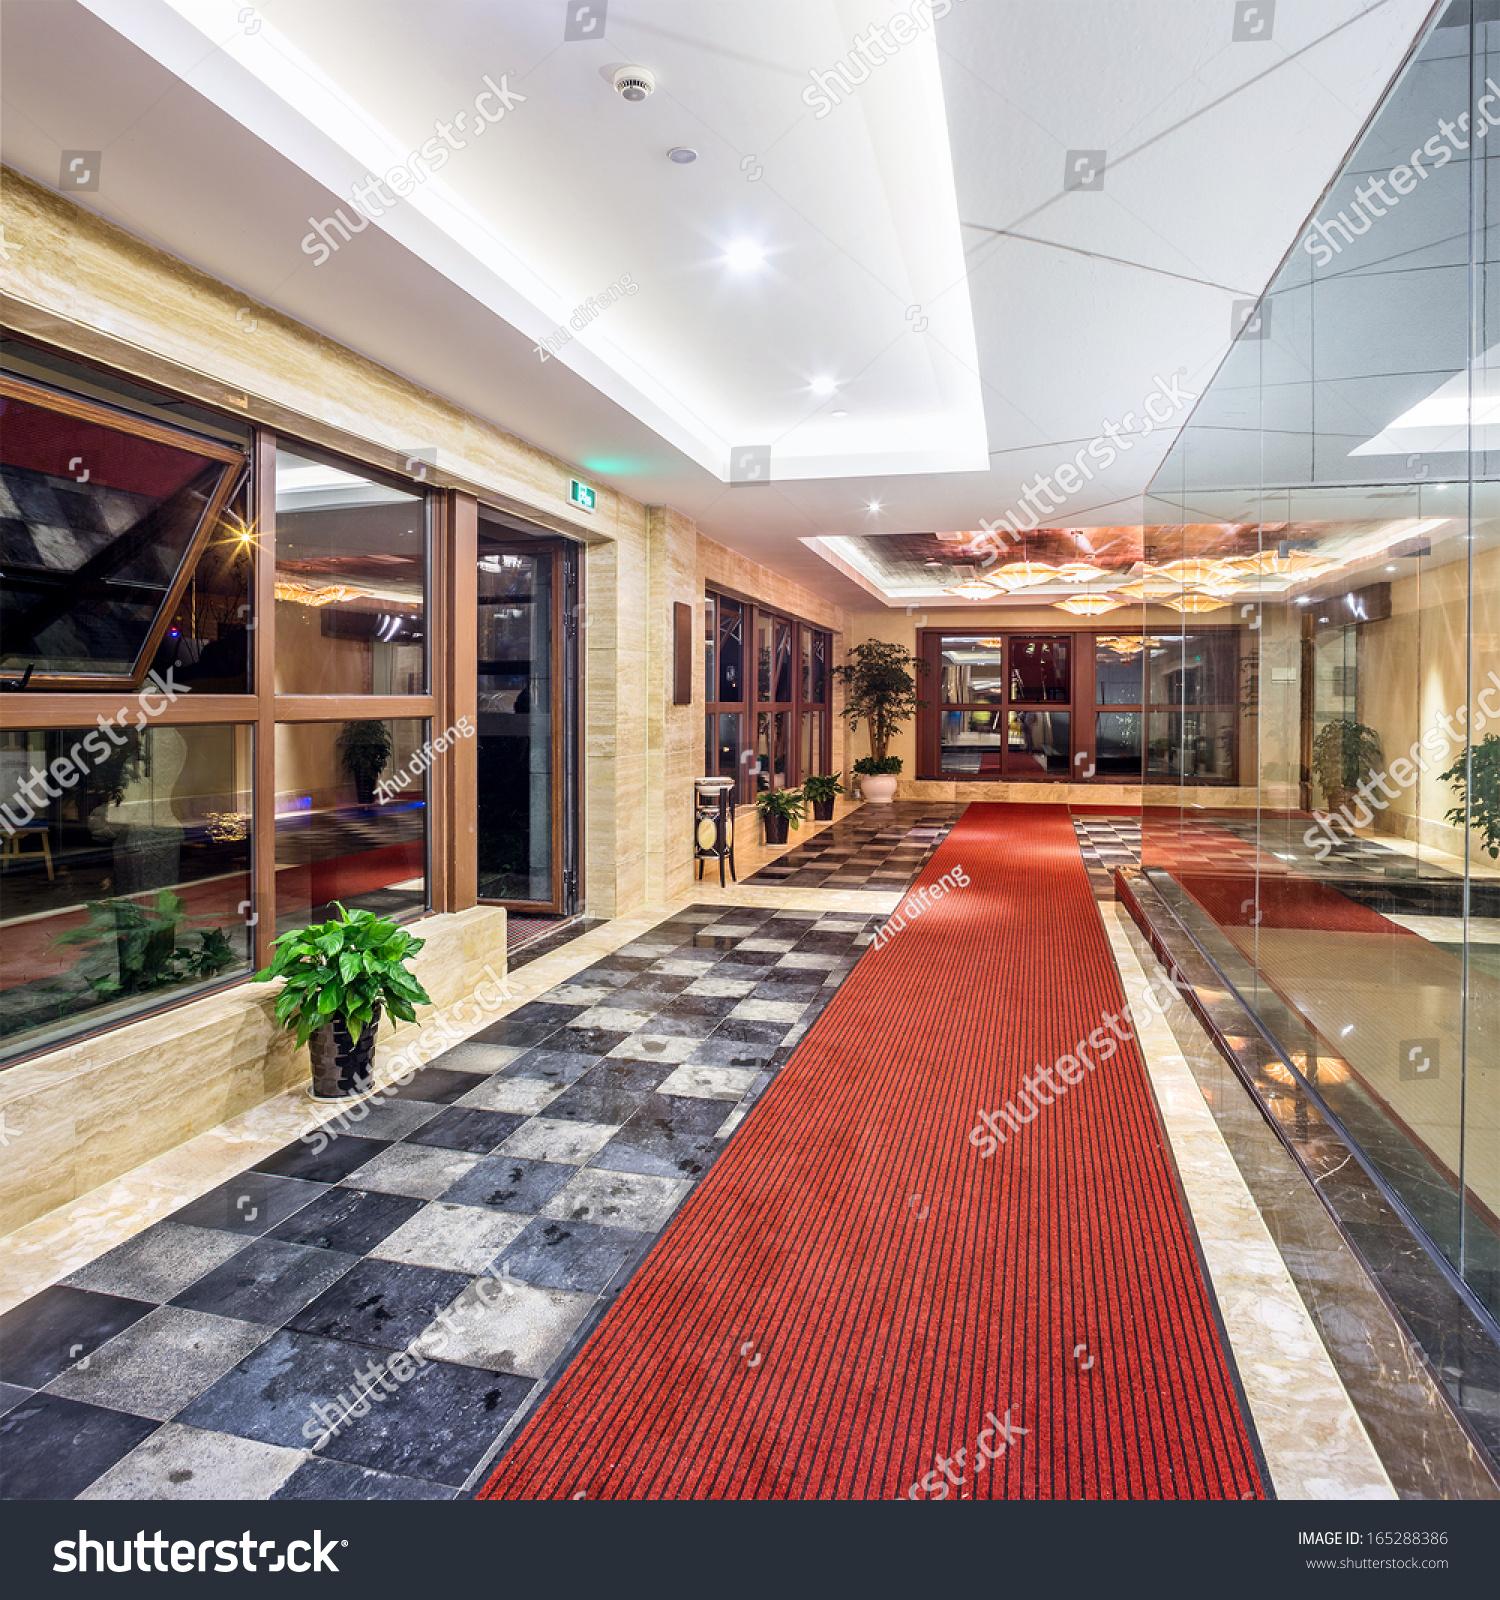 Contemporary Hotel Foyer : Hall modern hotel stock photo shutterstock